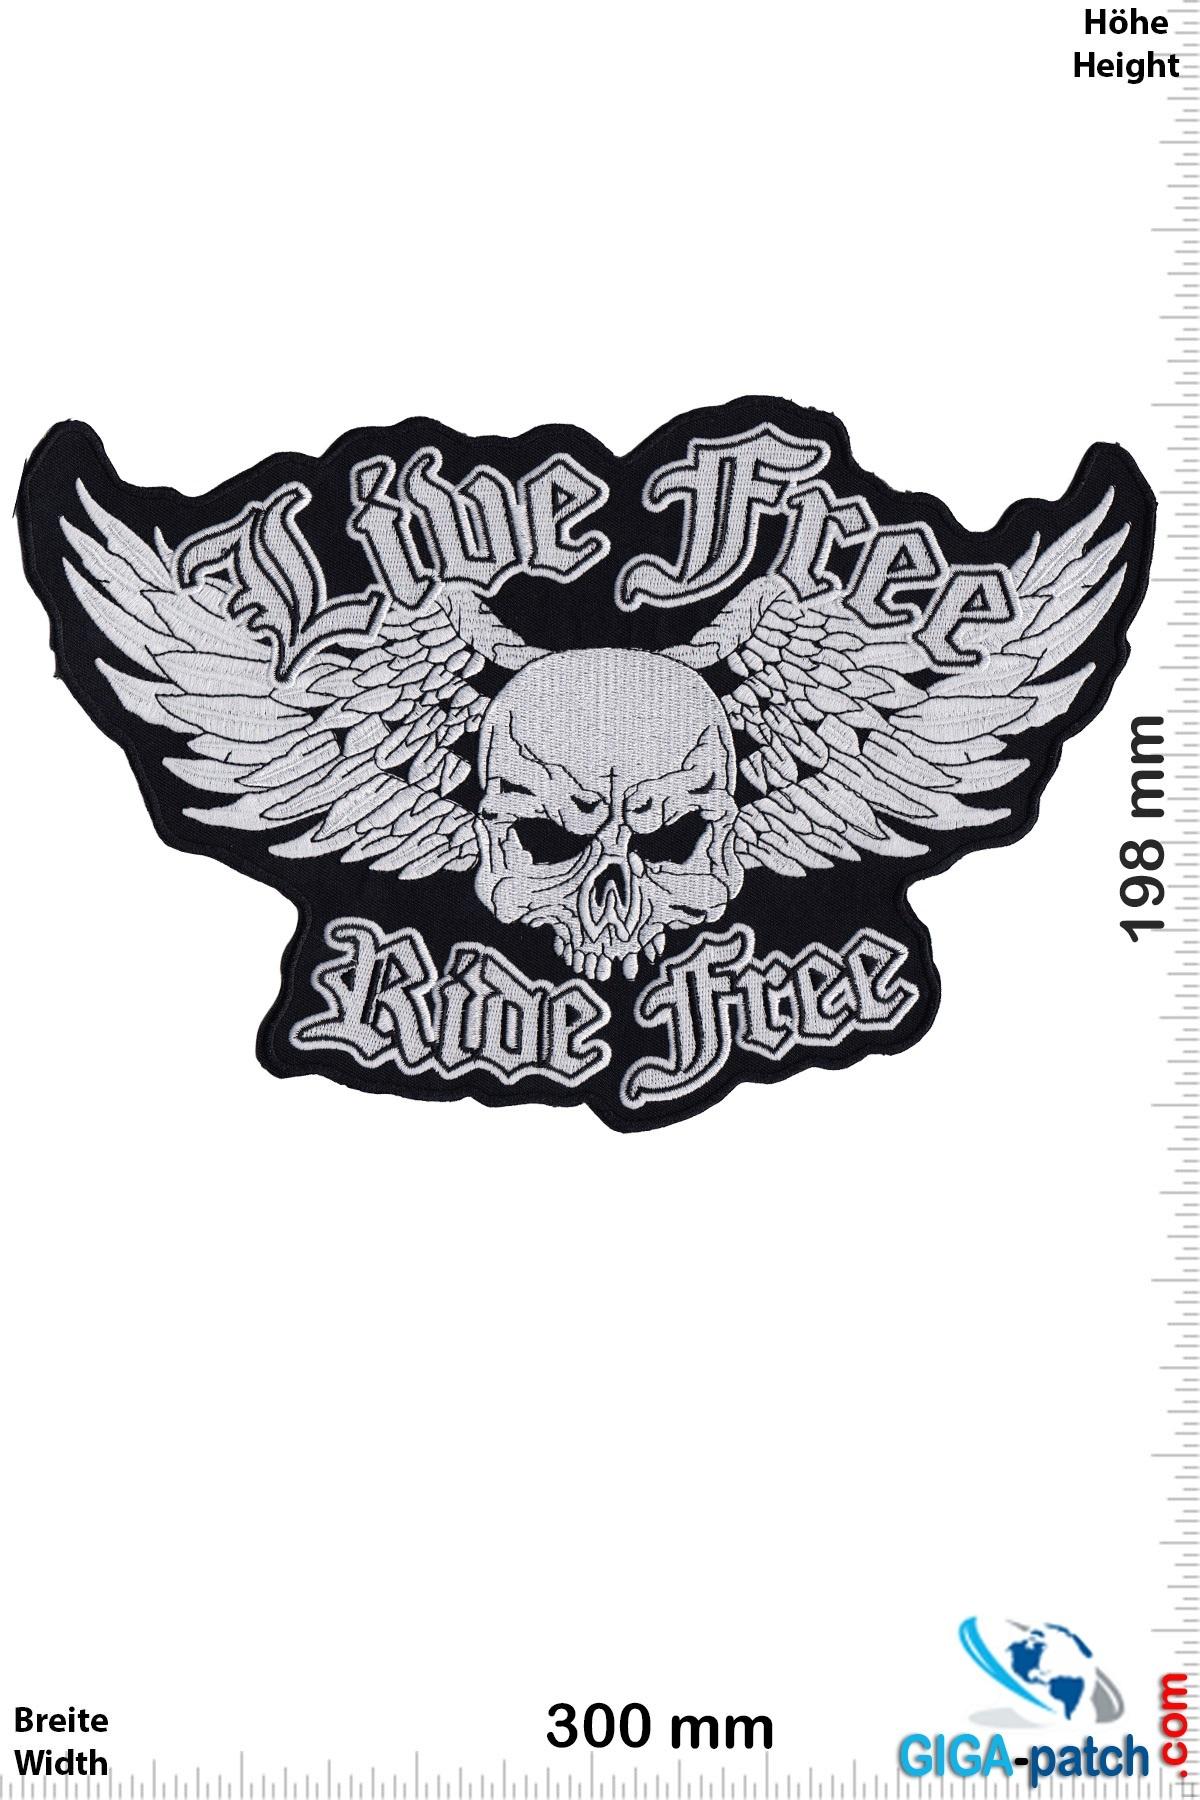 Skull Live Free - Ride Free  - 30 cm